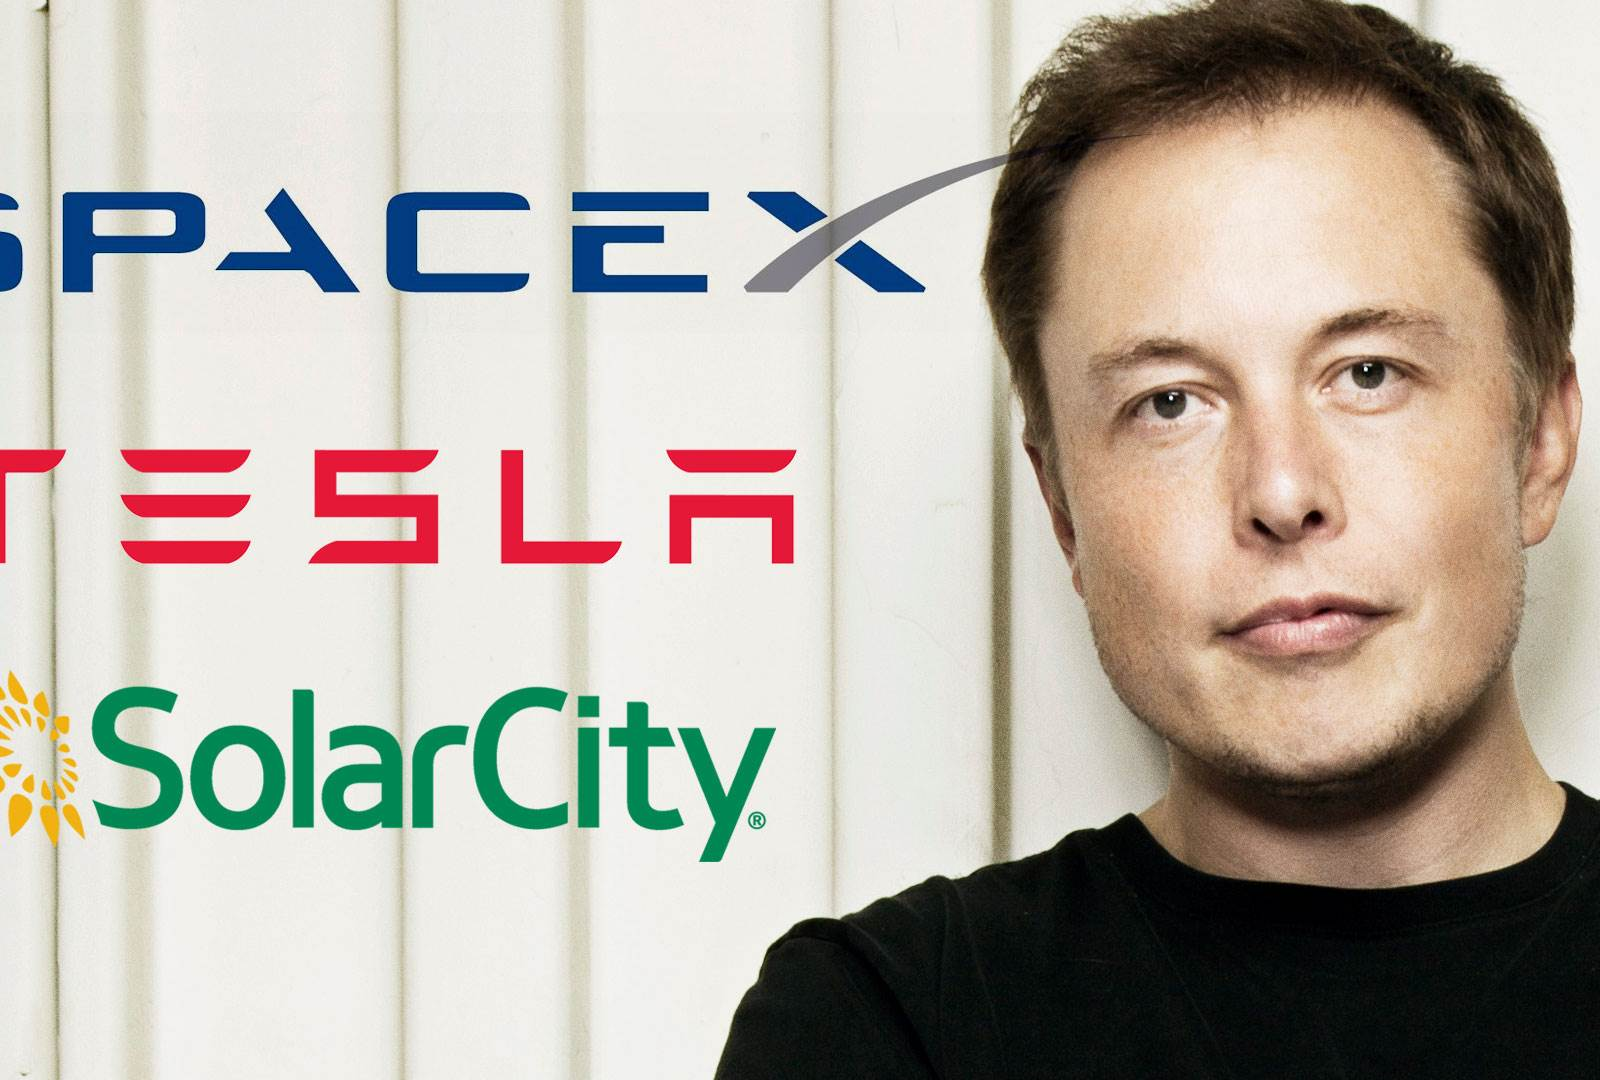 Tesla: Ετοιμάζει μεγάλη μονάδα στην Ευρώπη